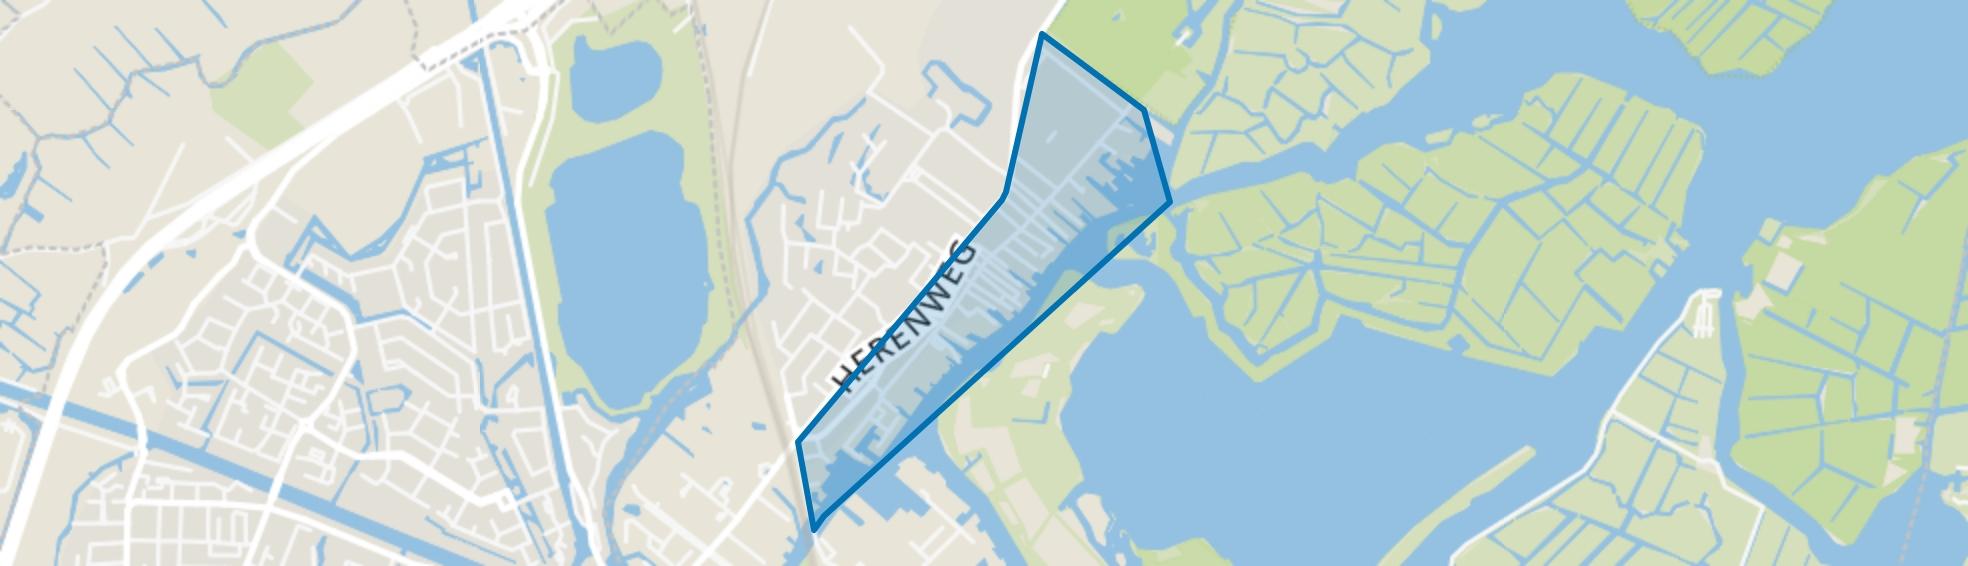 Middelbuurt, Warmond map